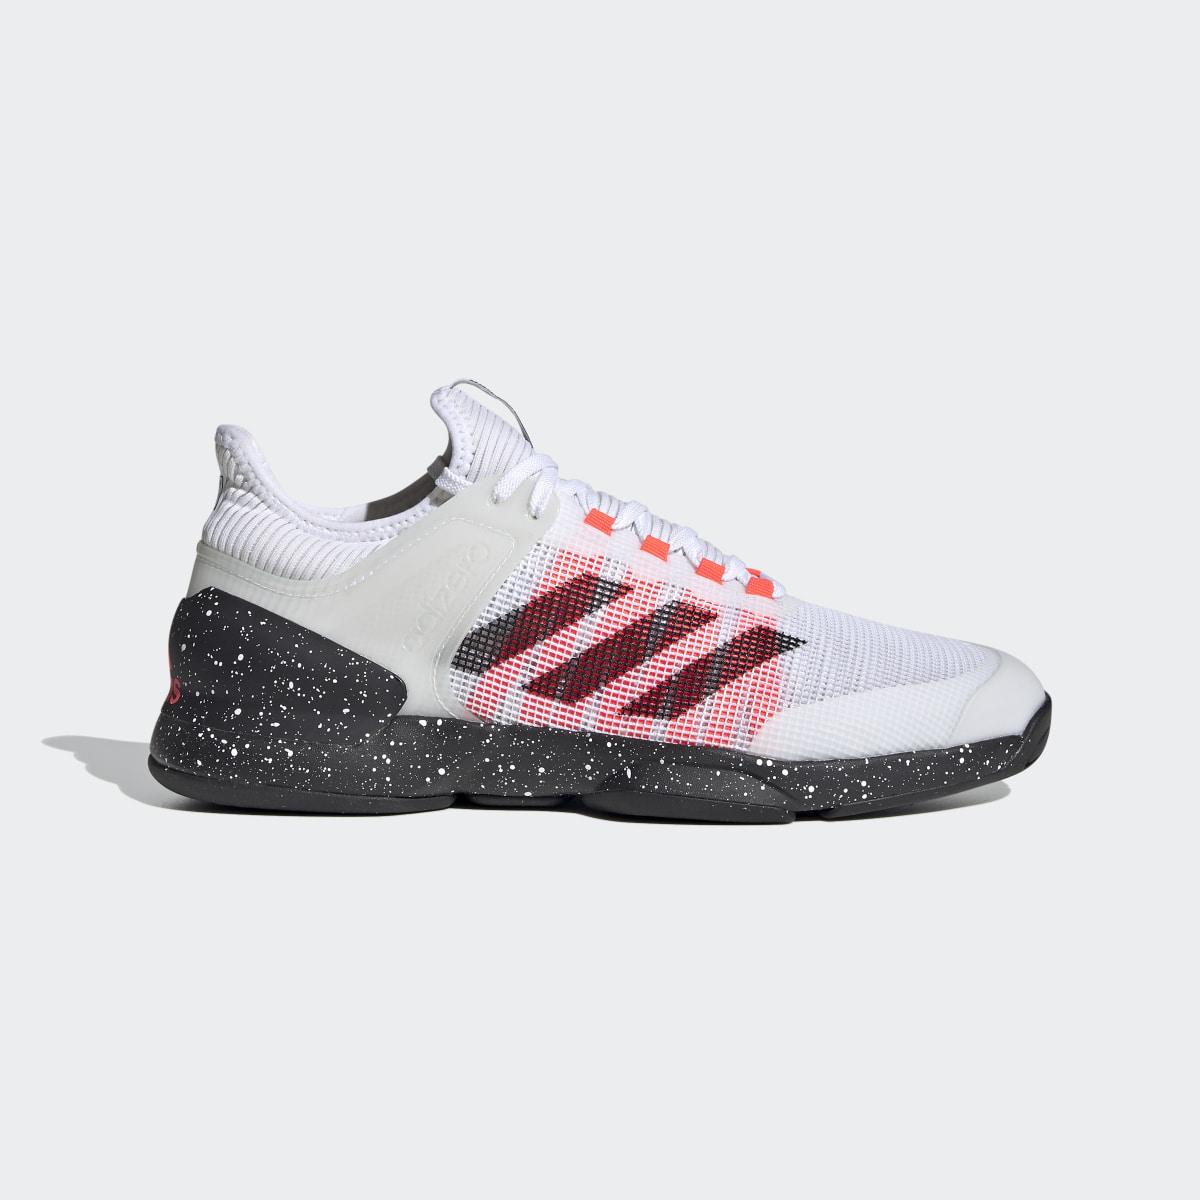 Ubersonic 2 hard court tennis shoes